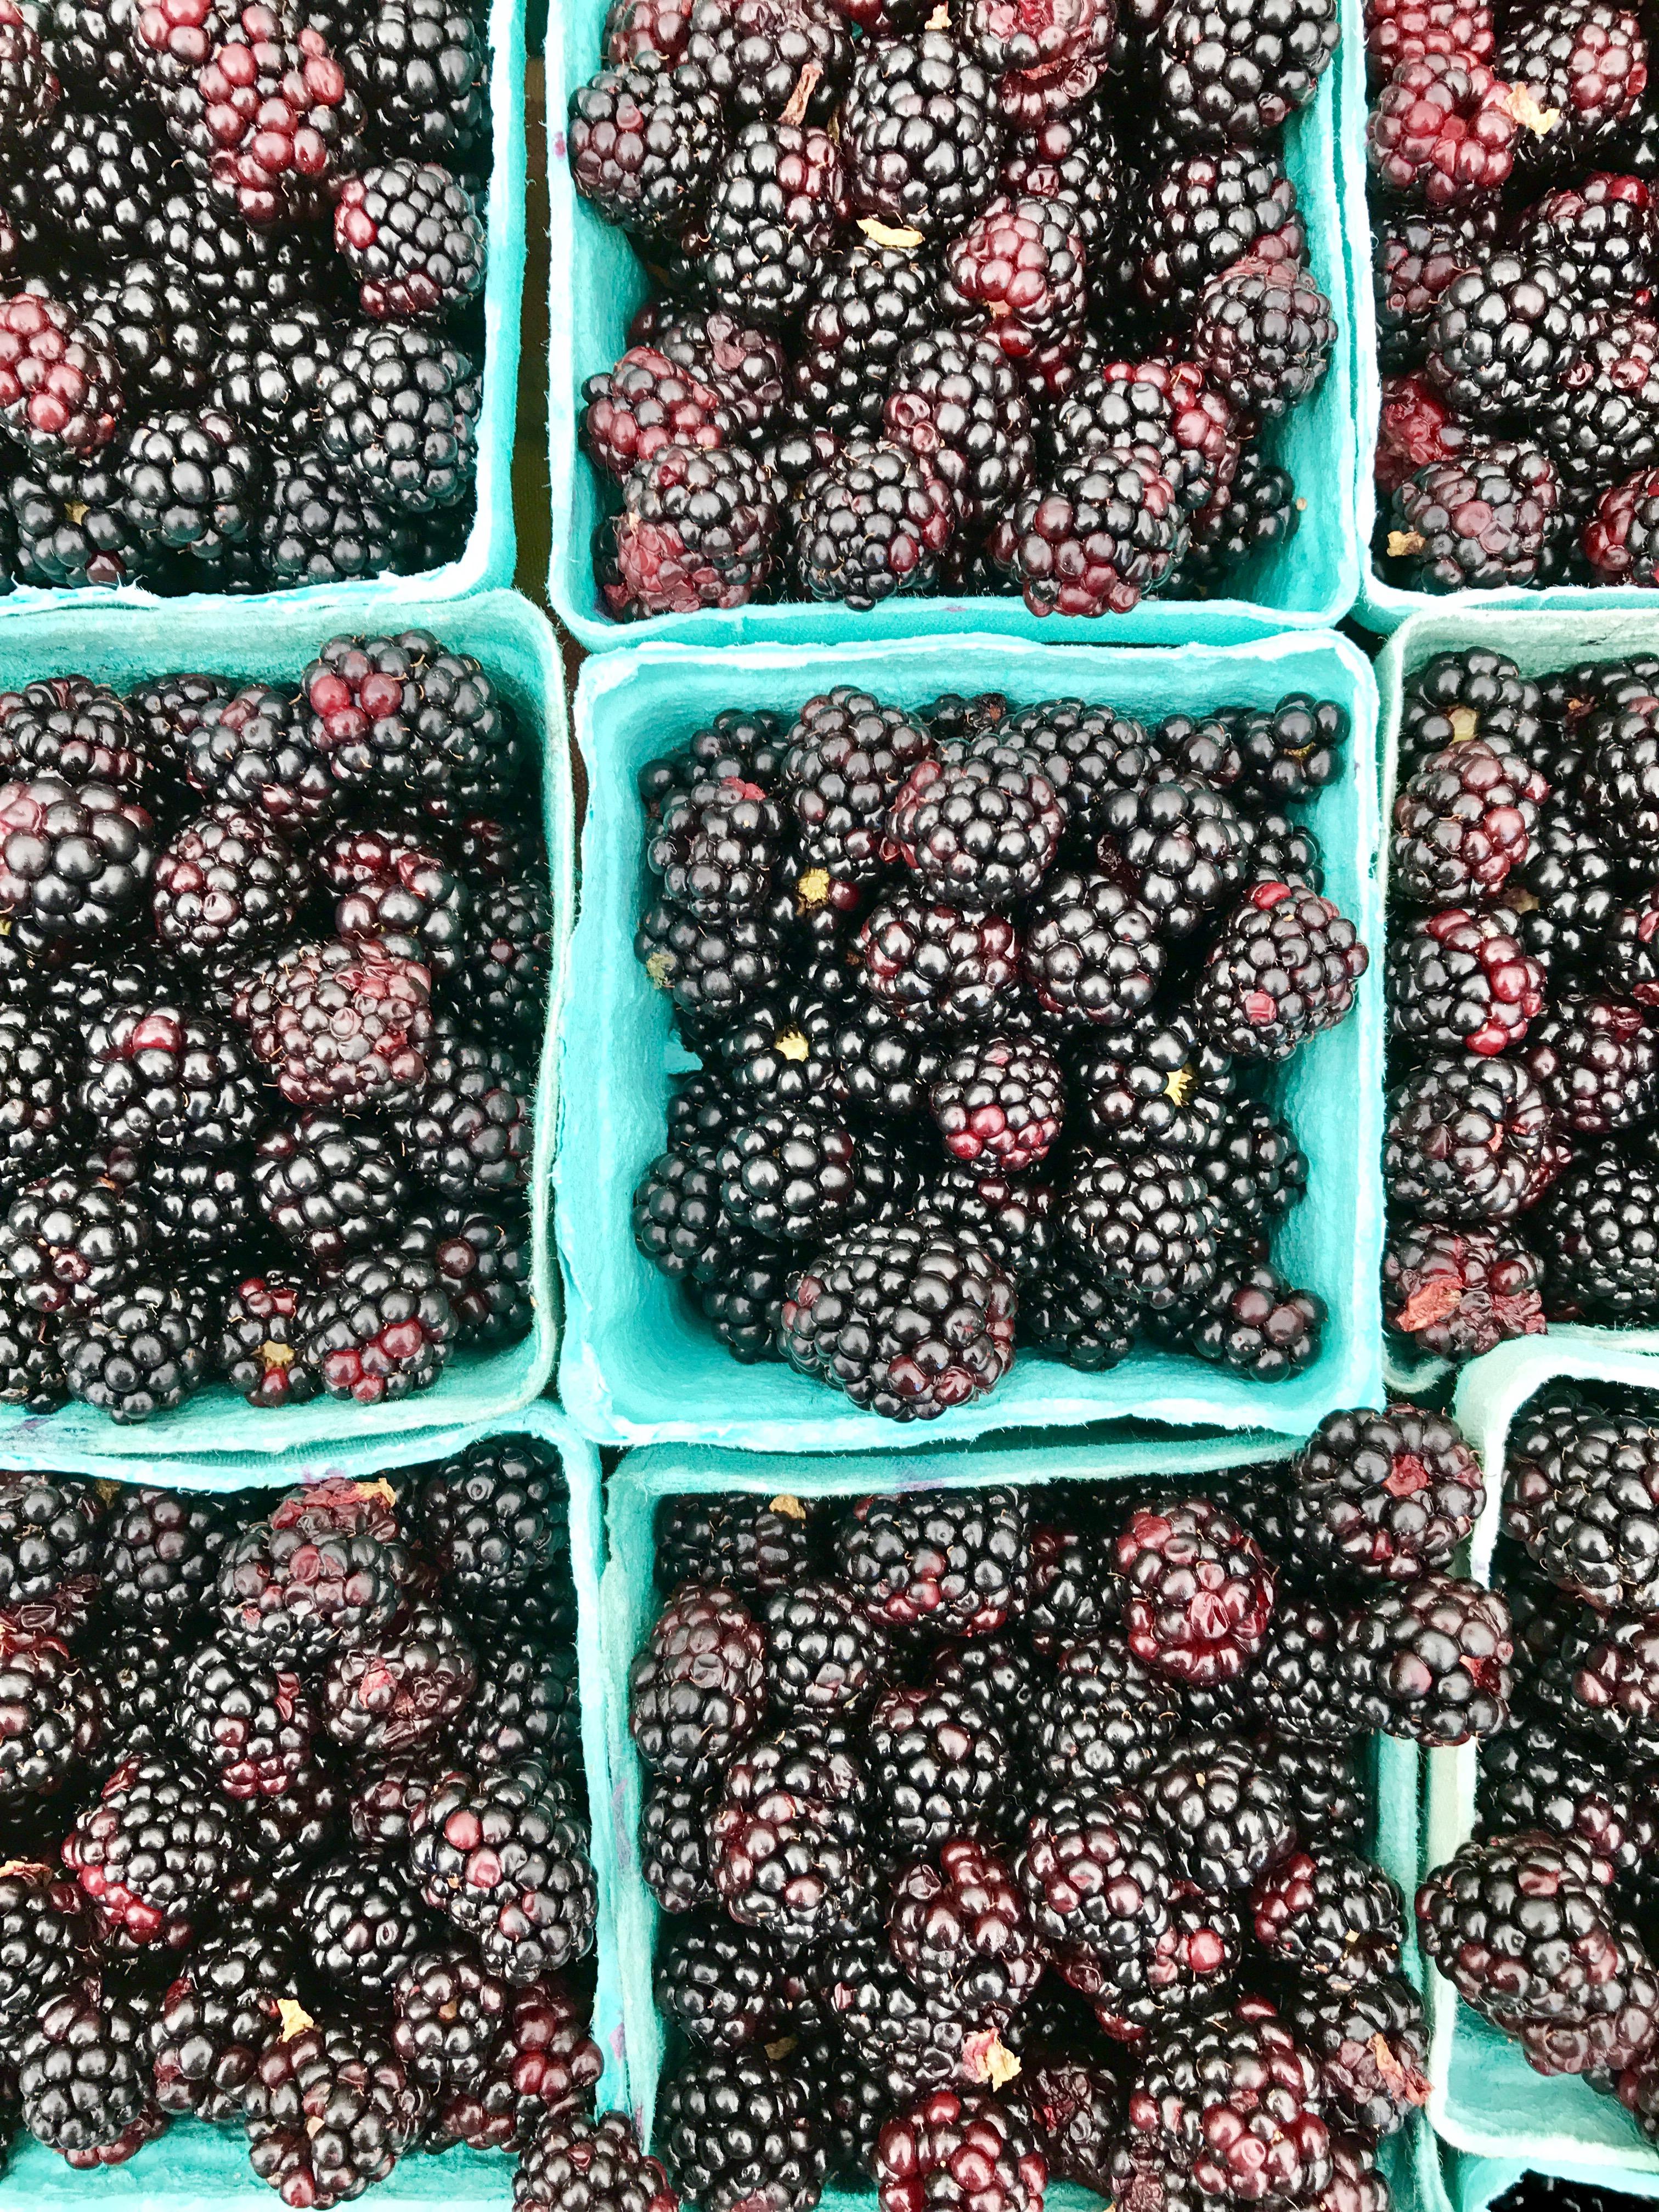 Featured Ingredient: Blackberries